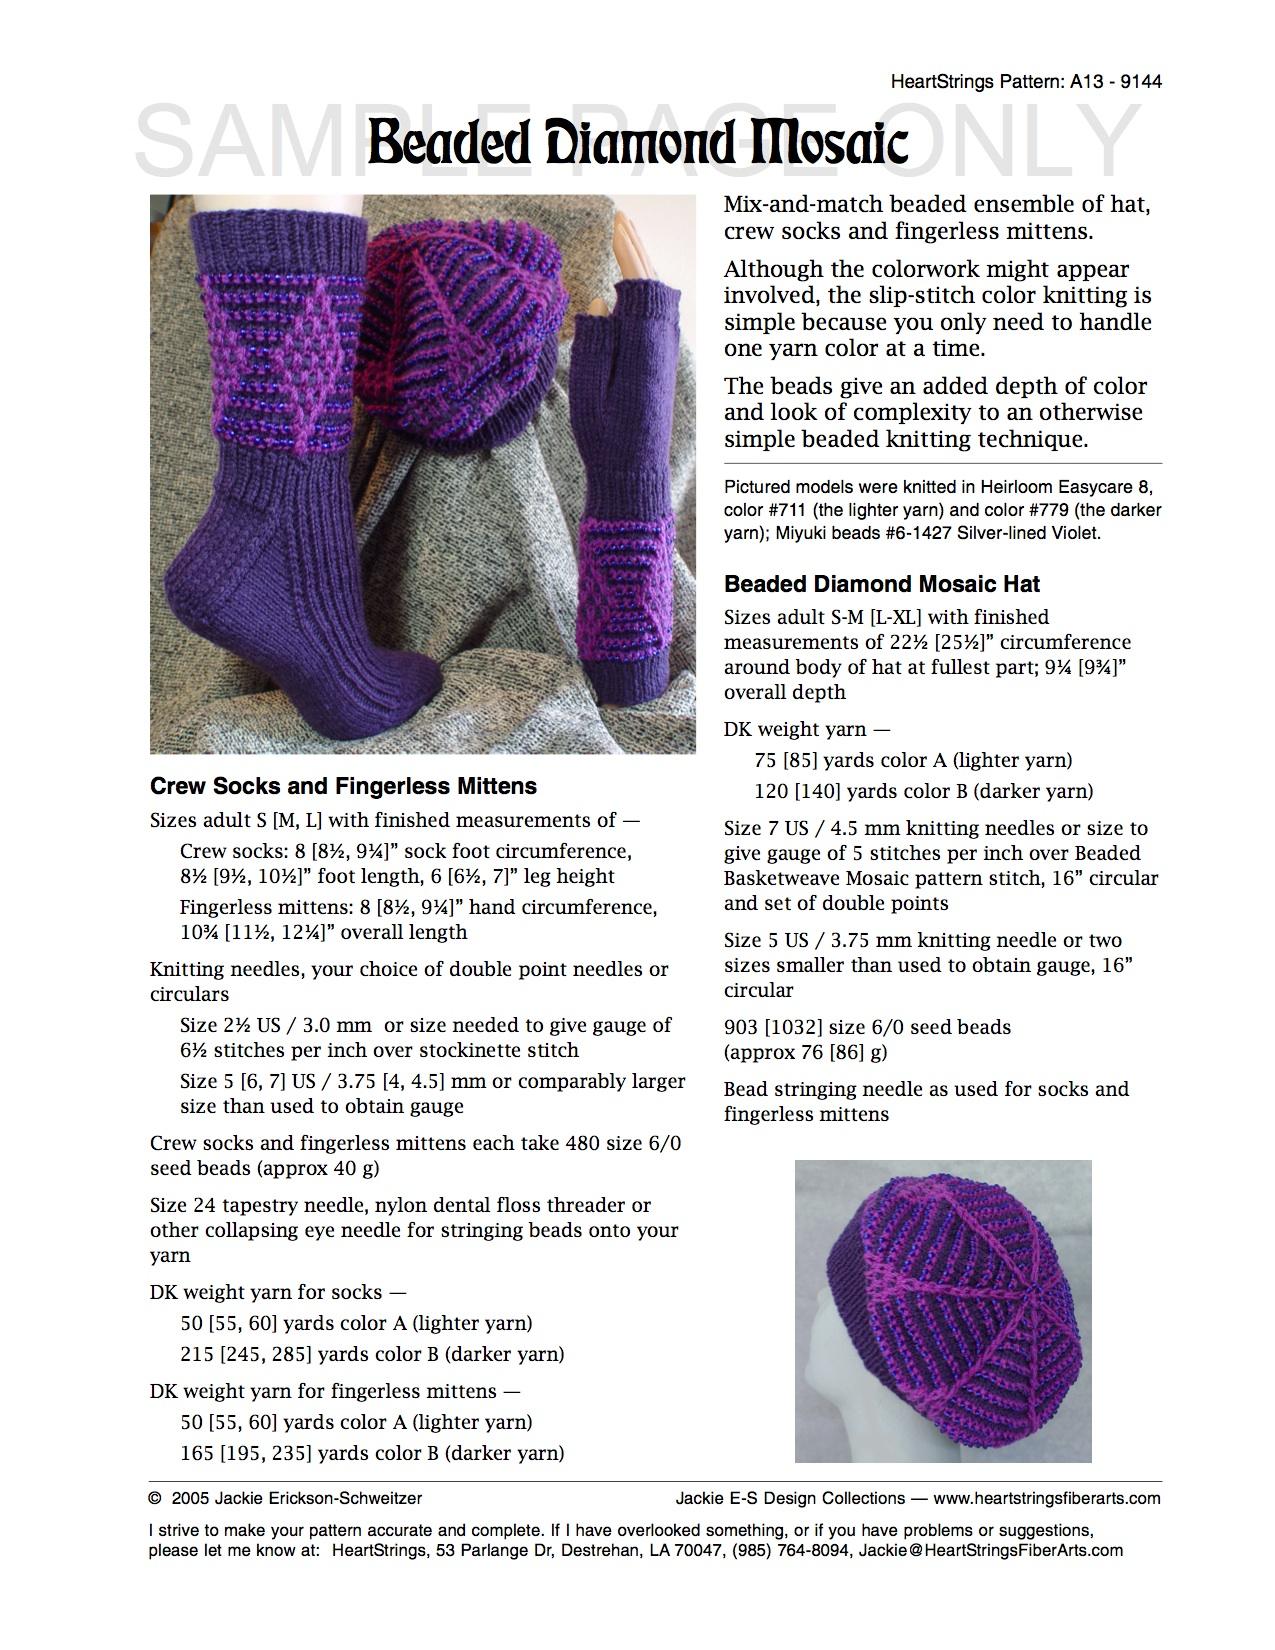 Bits of beads e patterns knit heartstrings learn and knit alongs beaded diamond mosaic ensemble e pattern bankloansurffo Gallery